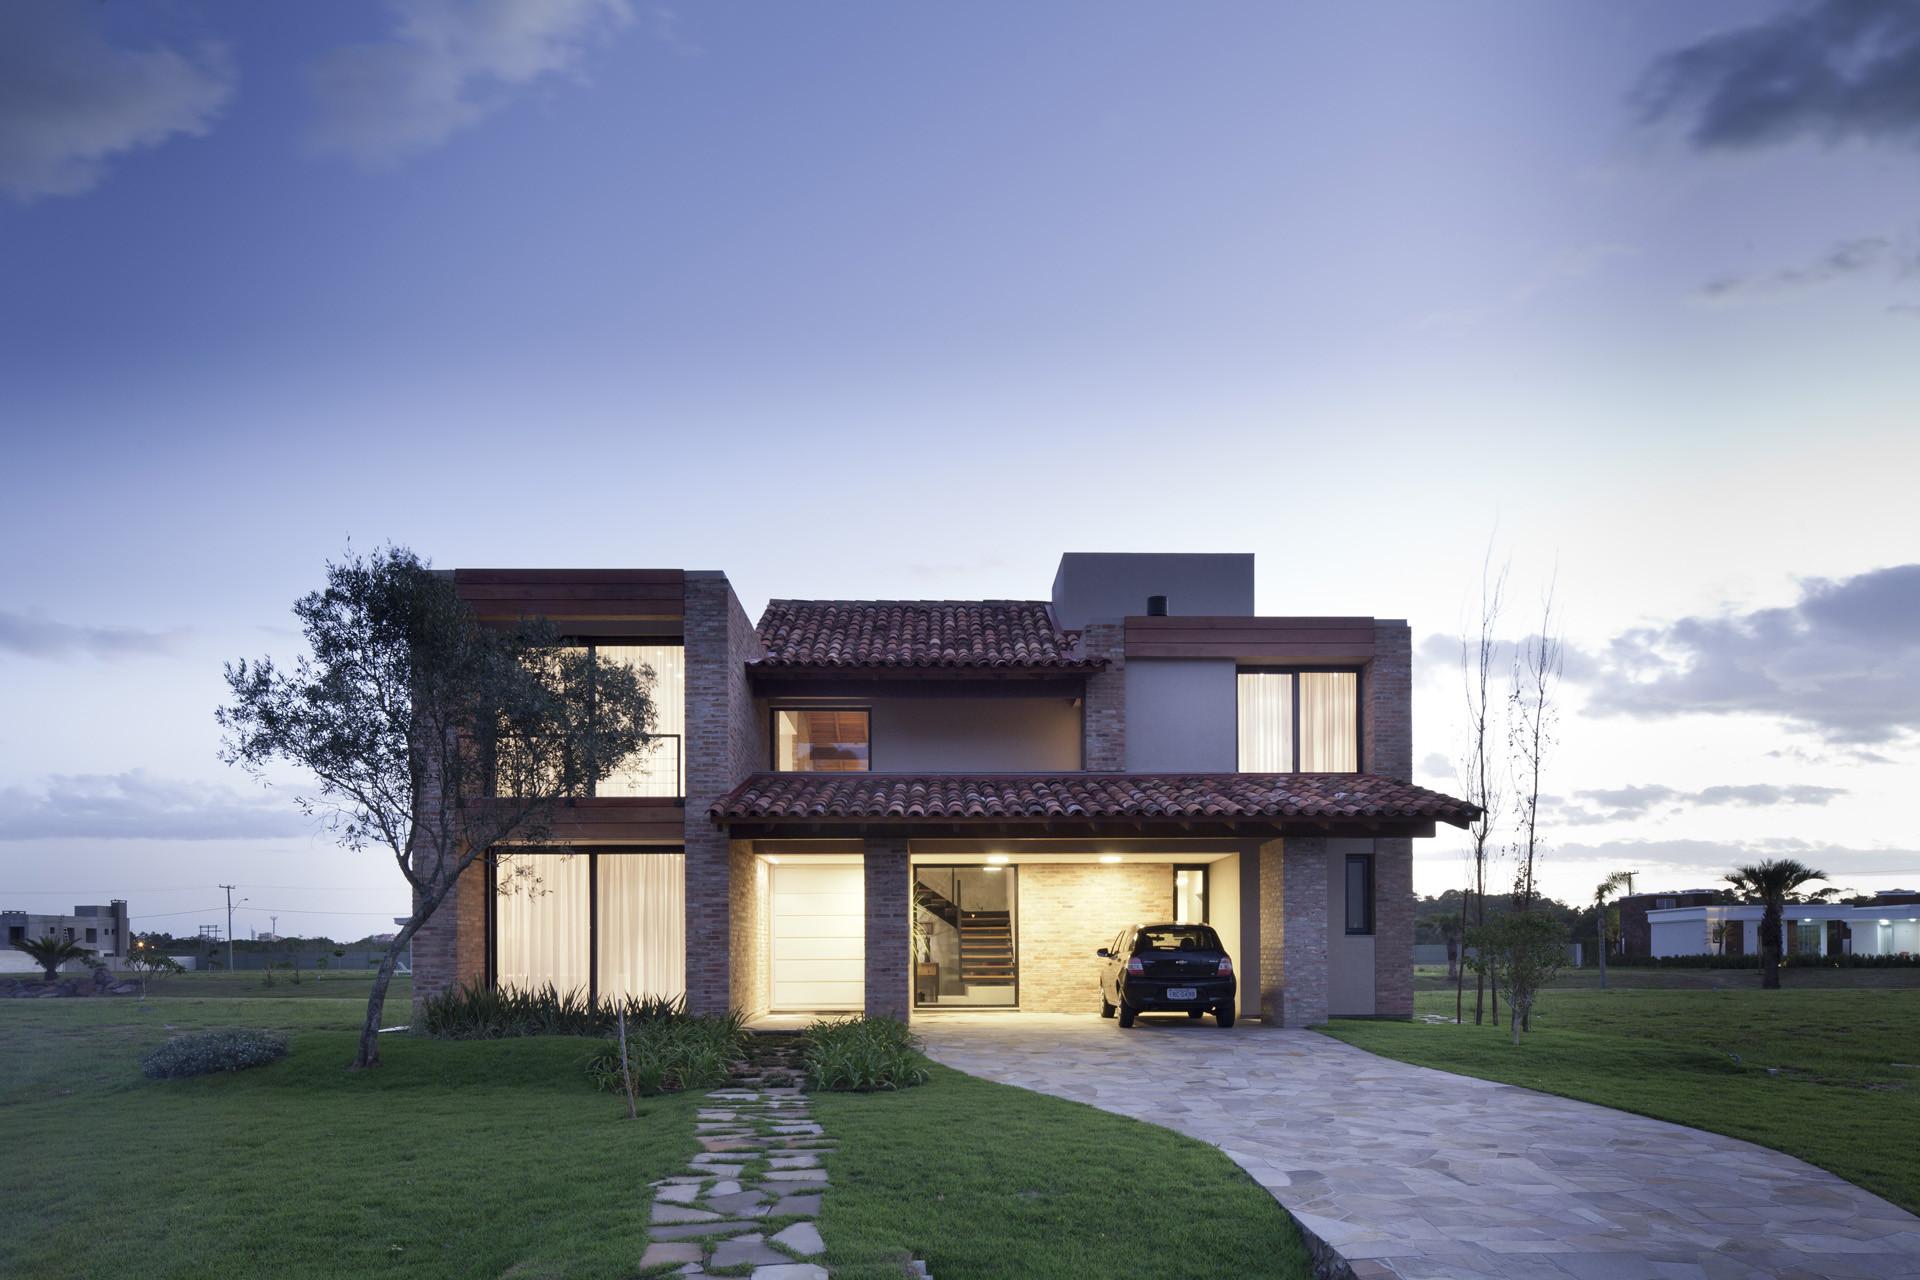 Casa CKN / Giugliani Montero Arquitectos, © Marcelo Donadussi